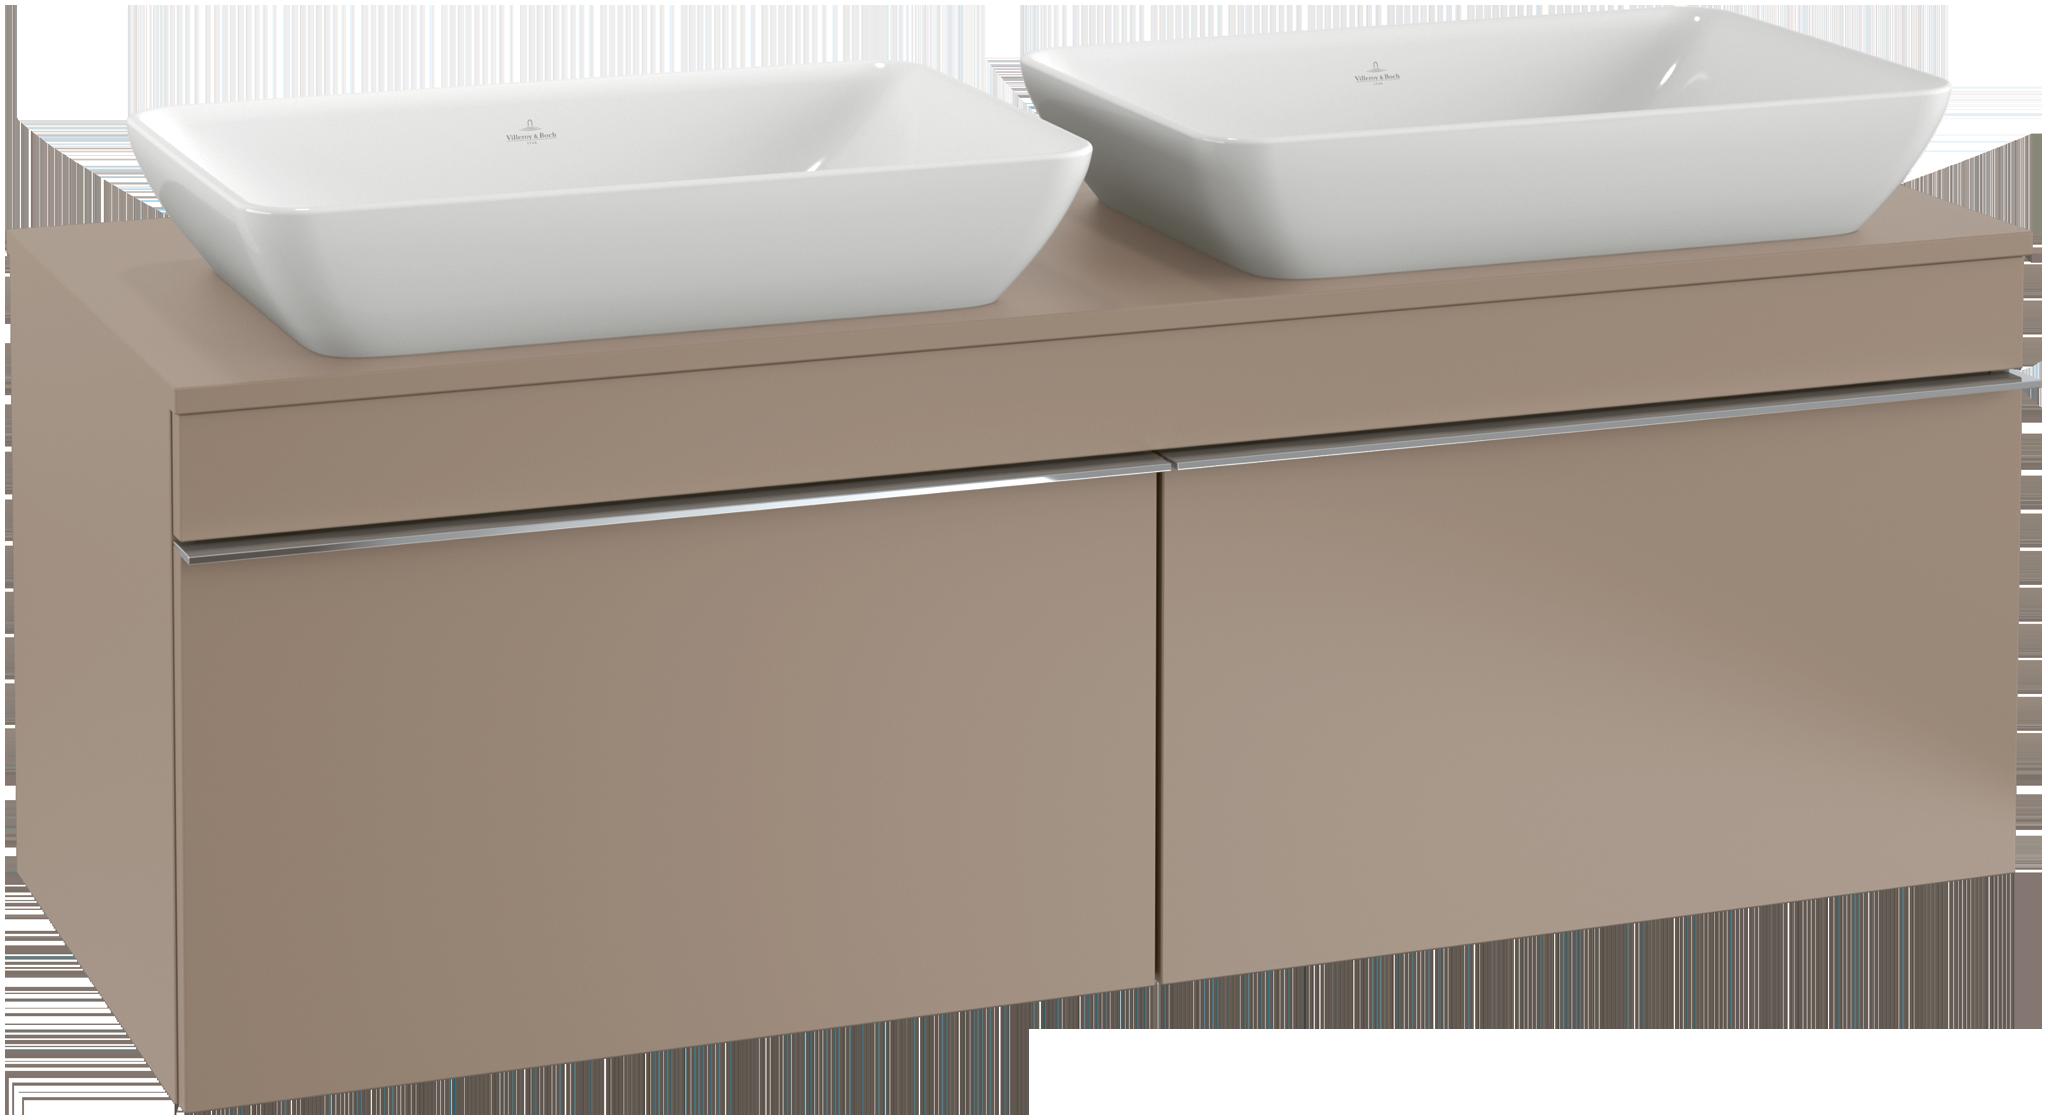 venticello waschtischunterschrank a94901 villeroy boch. Black Bedroom Furniture Sets. Home Design Ideas